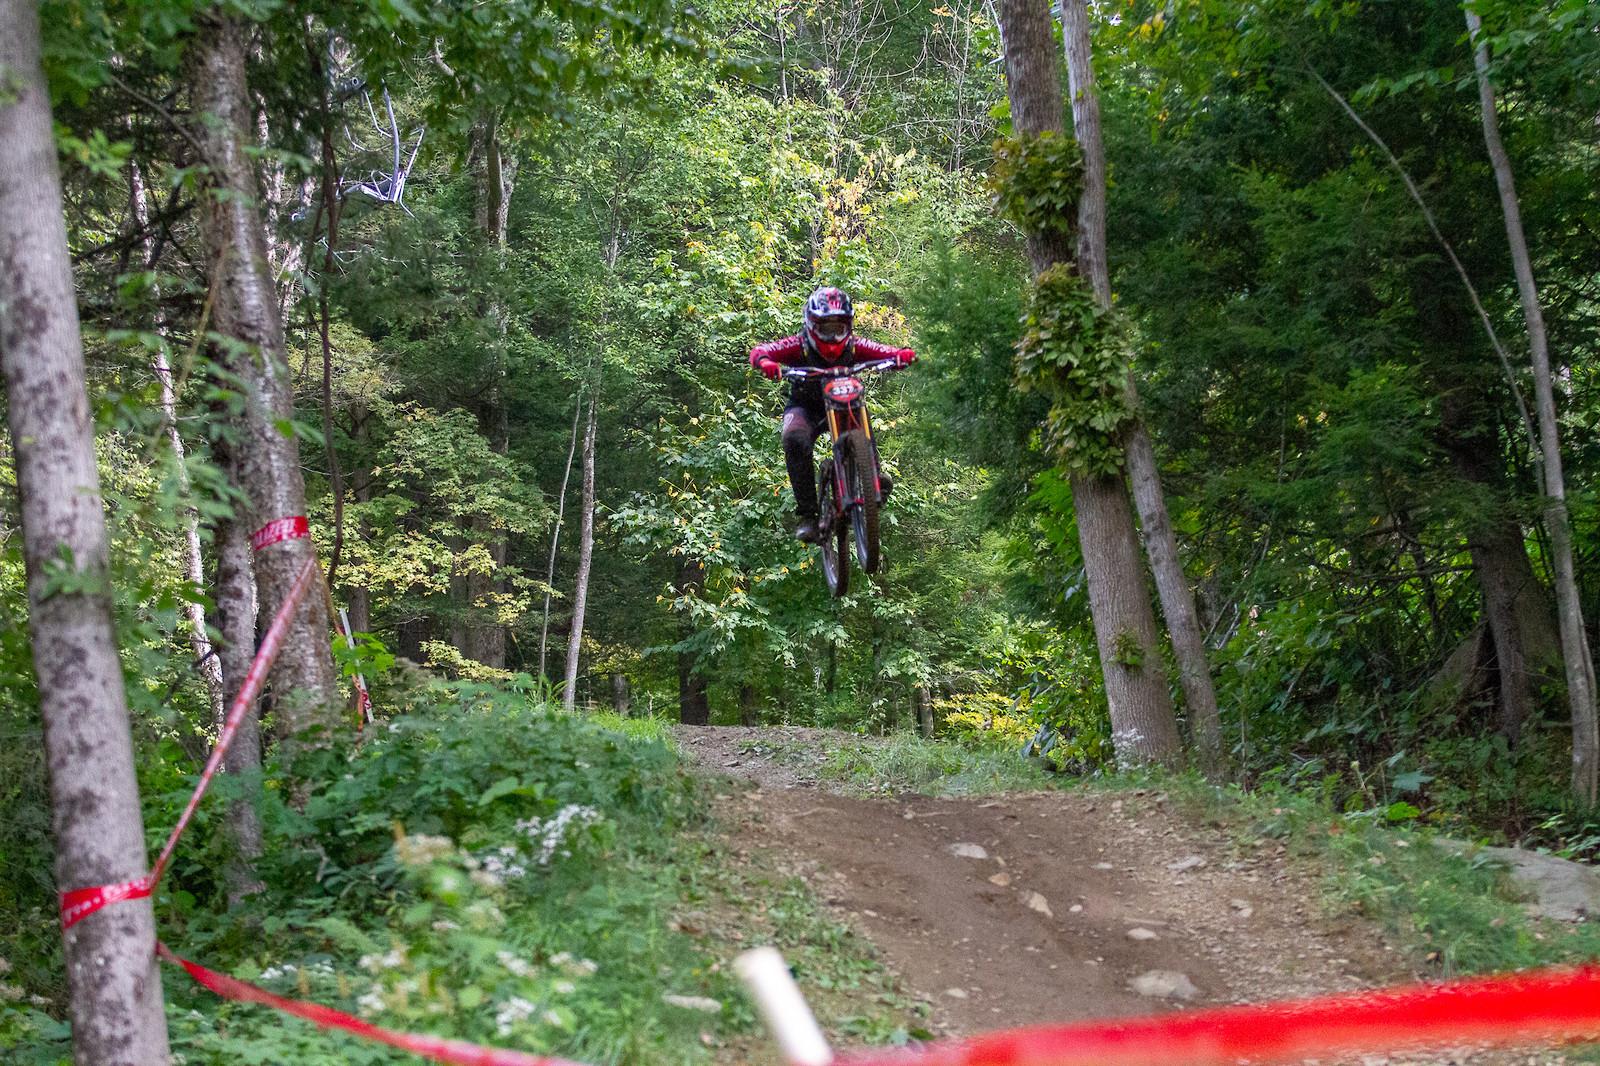 Ivanna Estrada - JackRice - Mountain Biking Pictures - Vital MTB